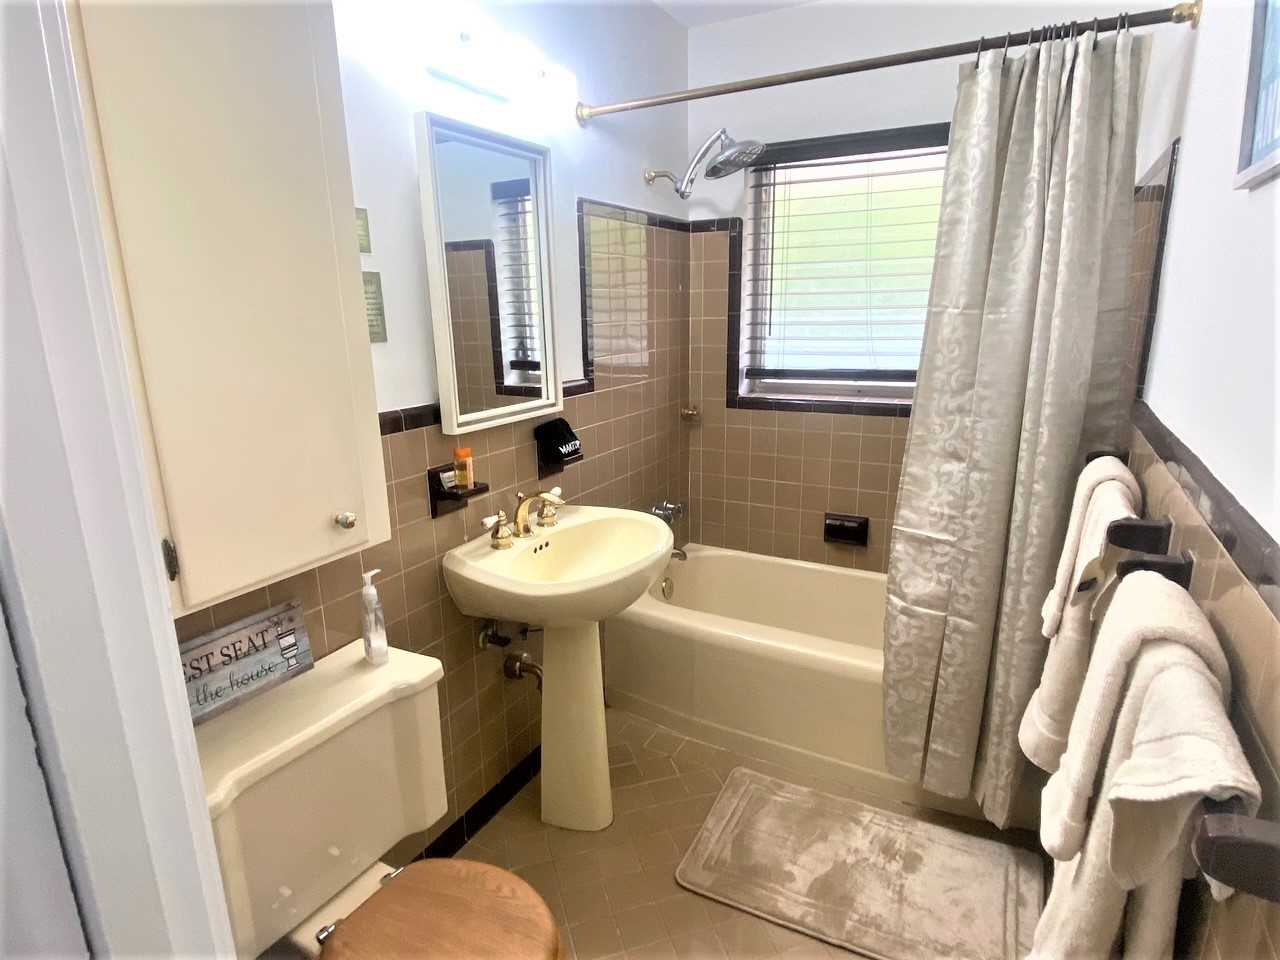 Master bath ensuite has combo tub/shower.